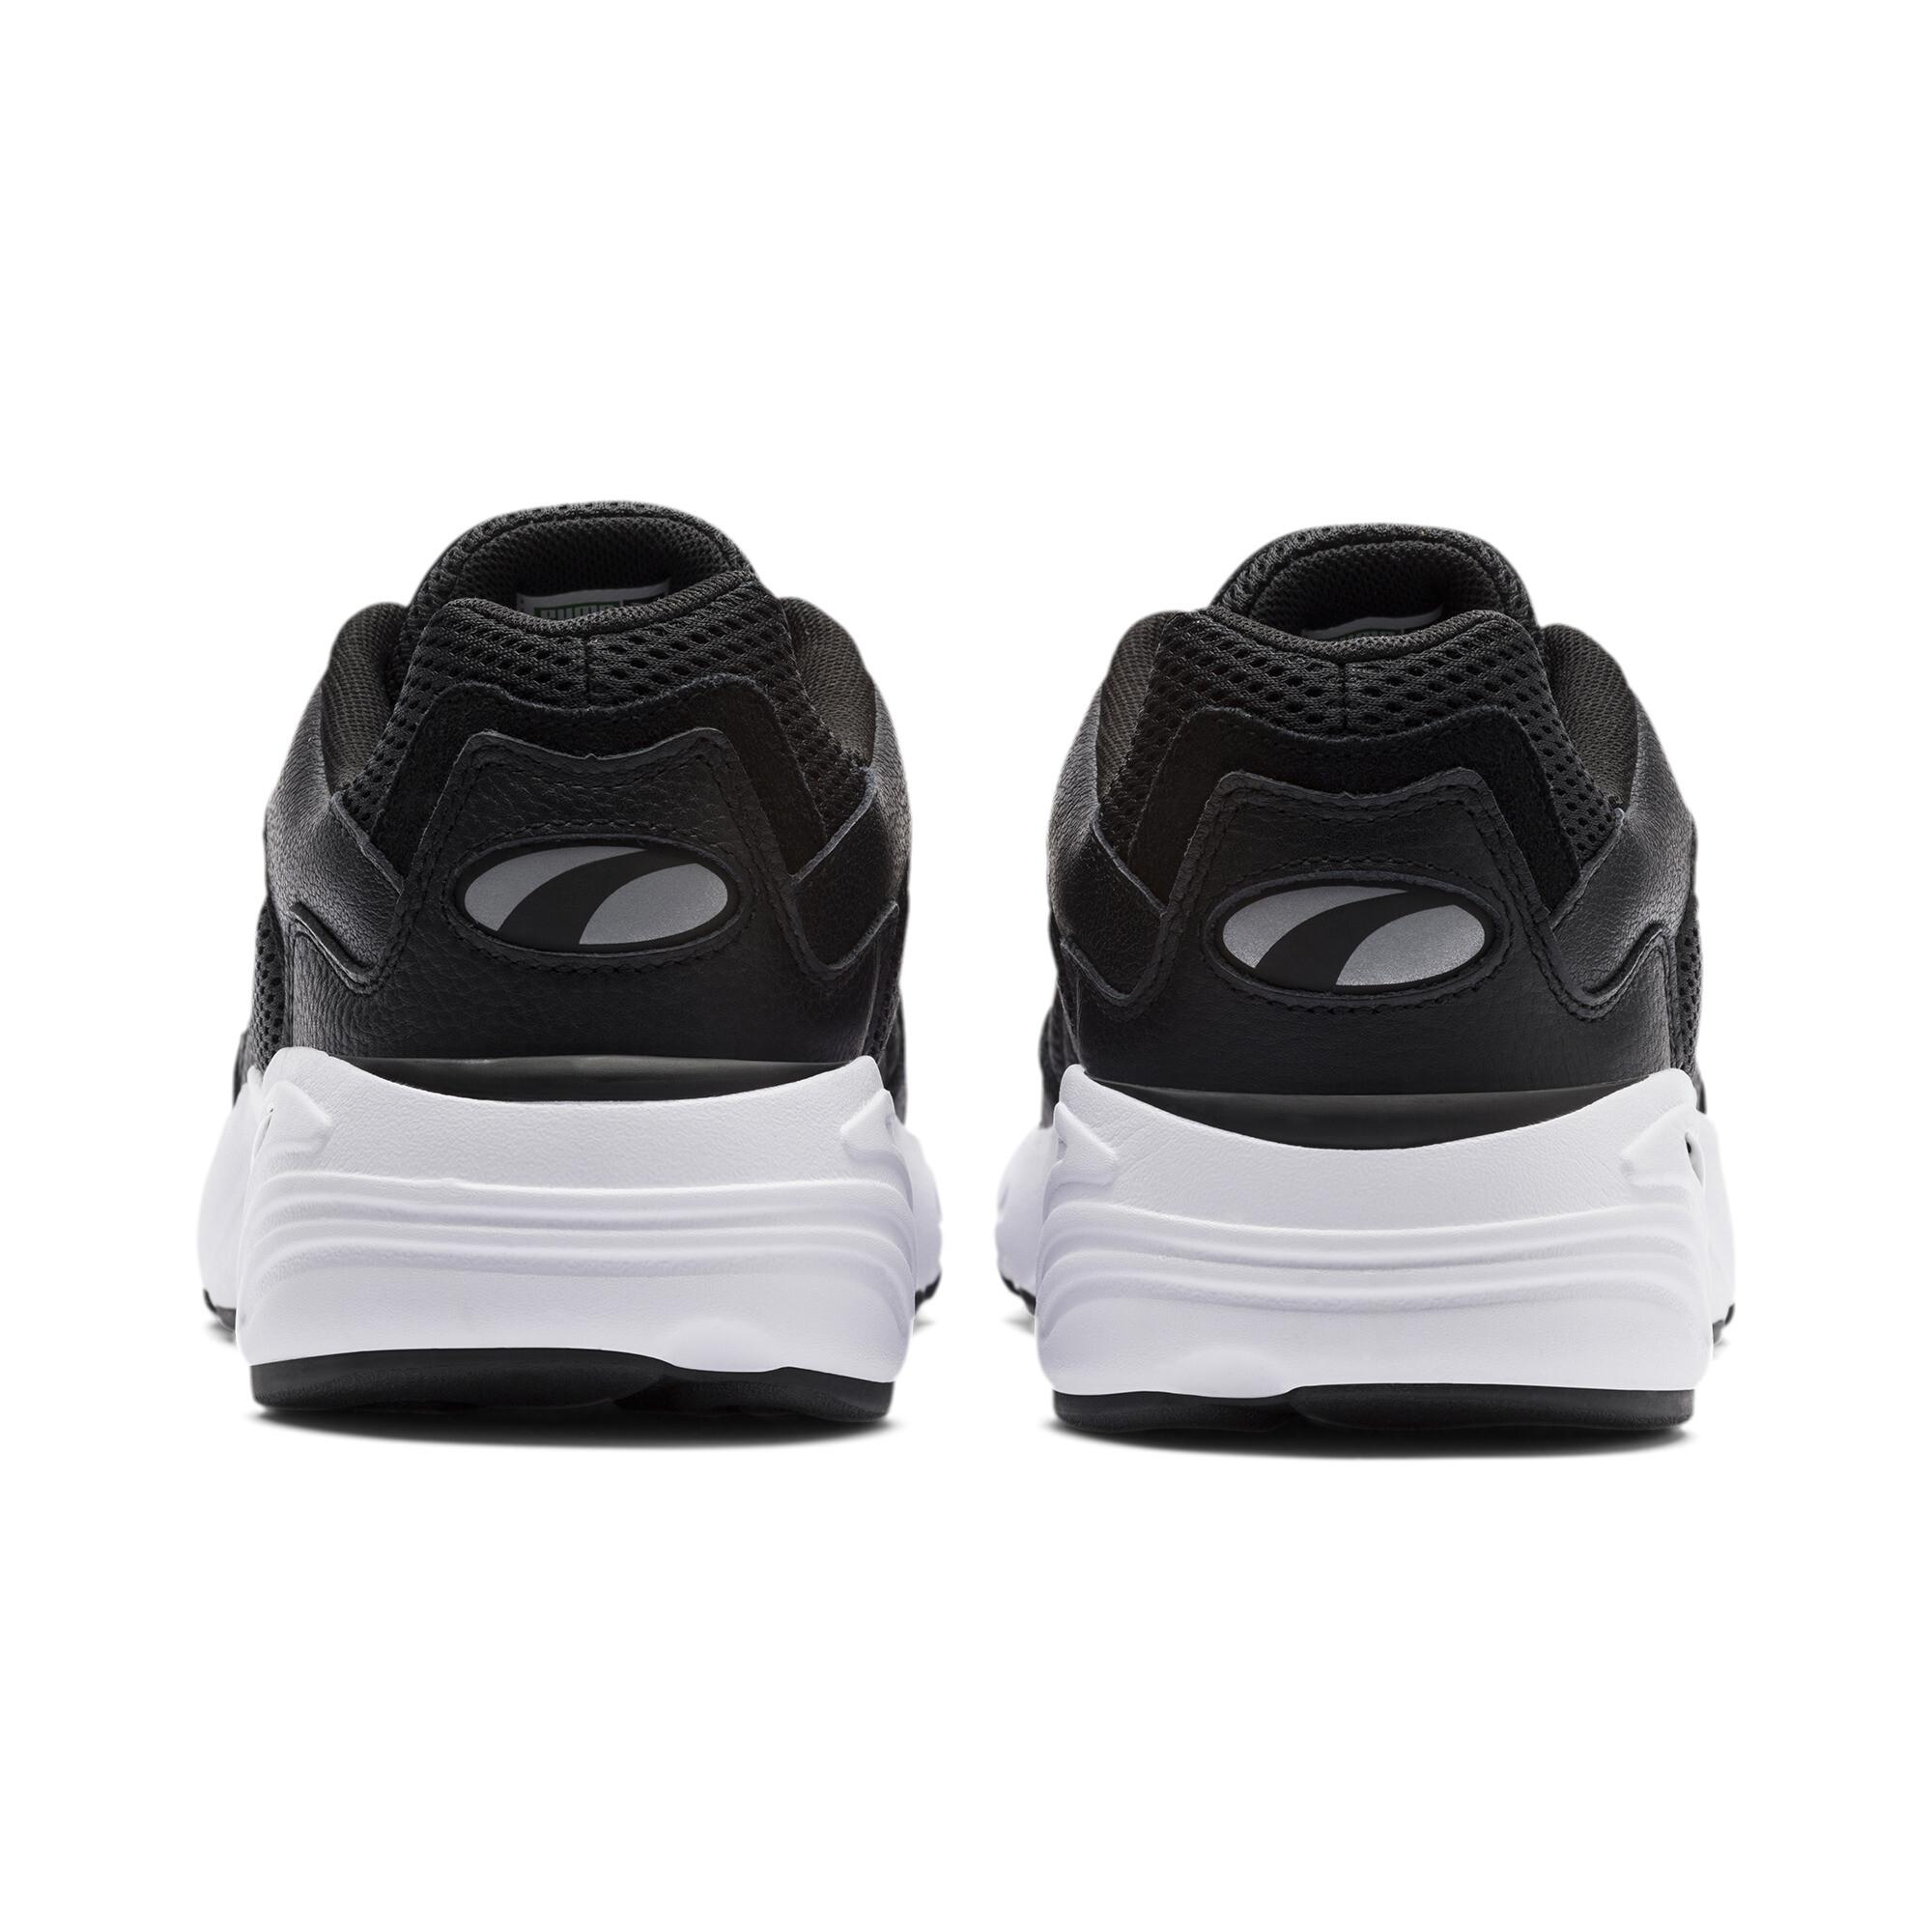 Indexbild 3 - PUMA CELL Viper Leather Sneaker Unisex Schuhe Sport Classics Neu